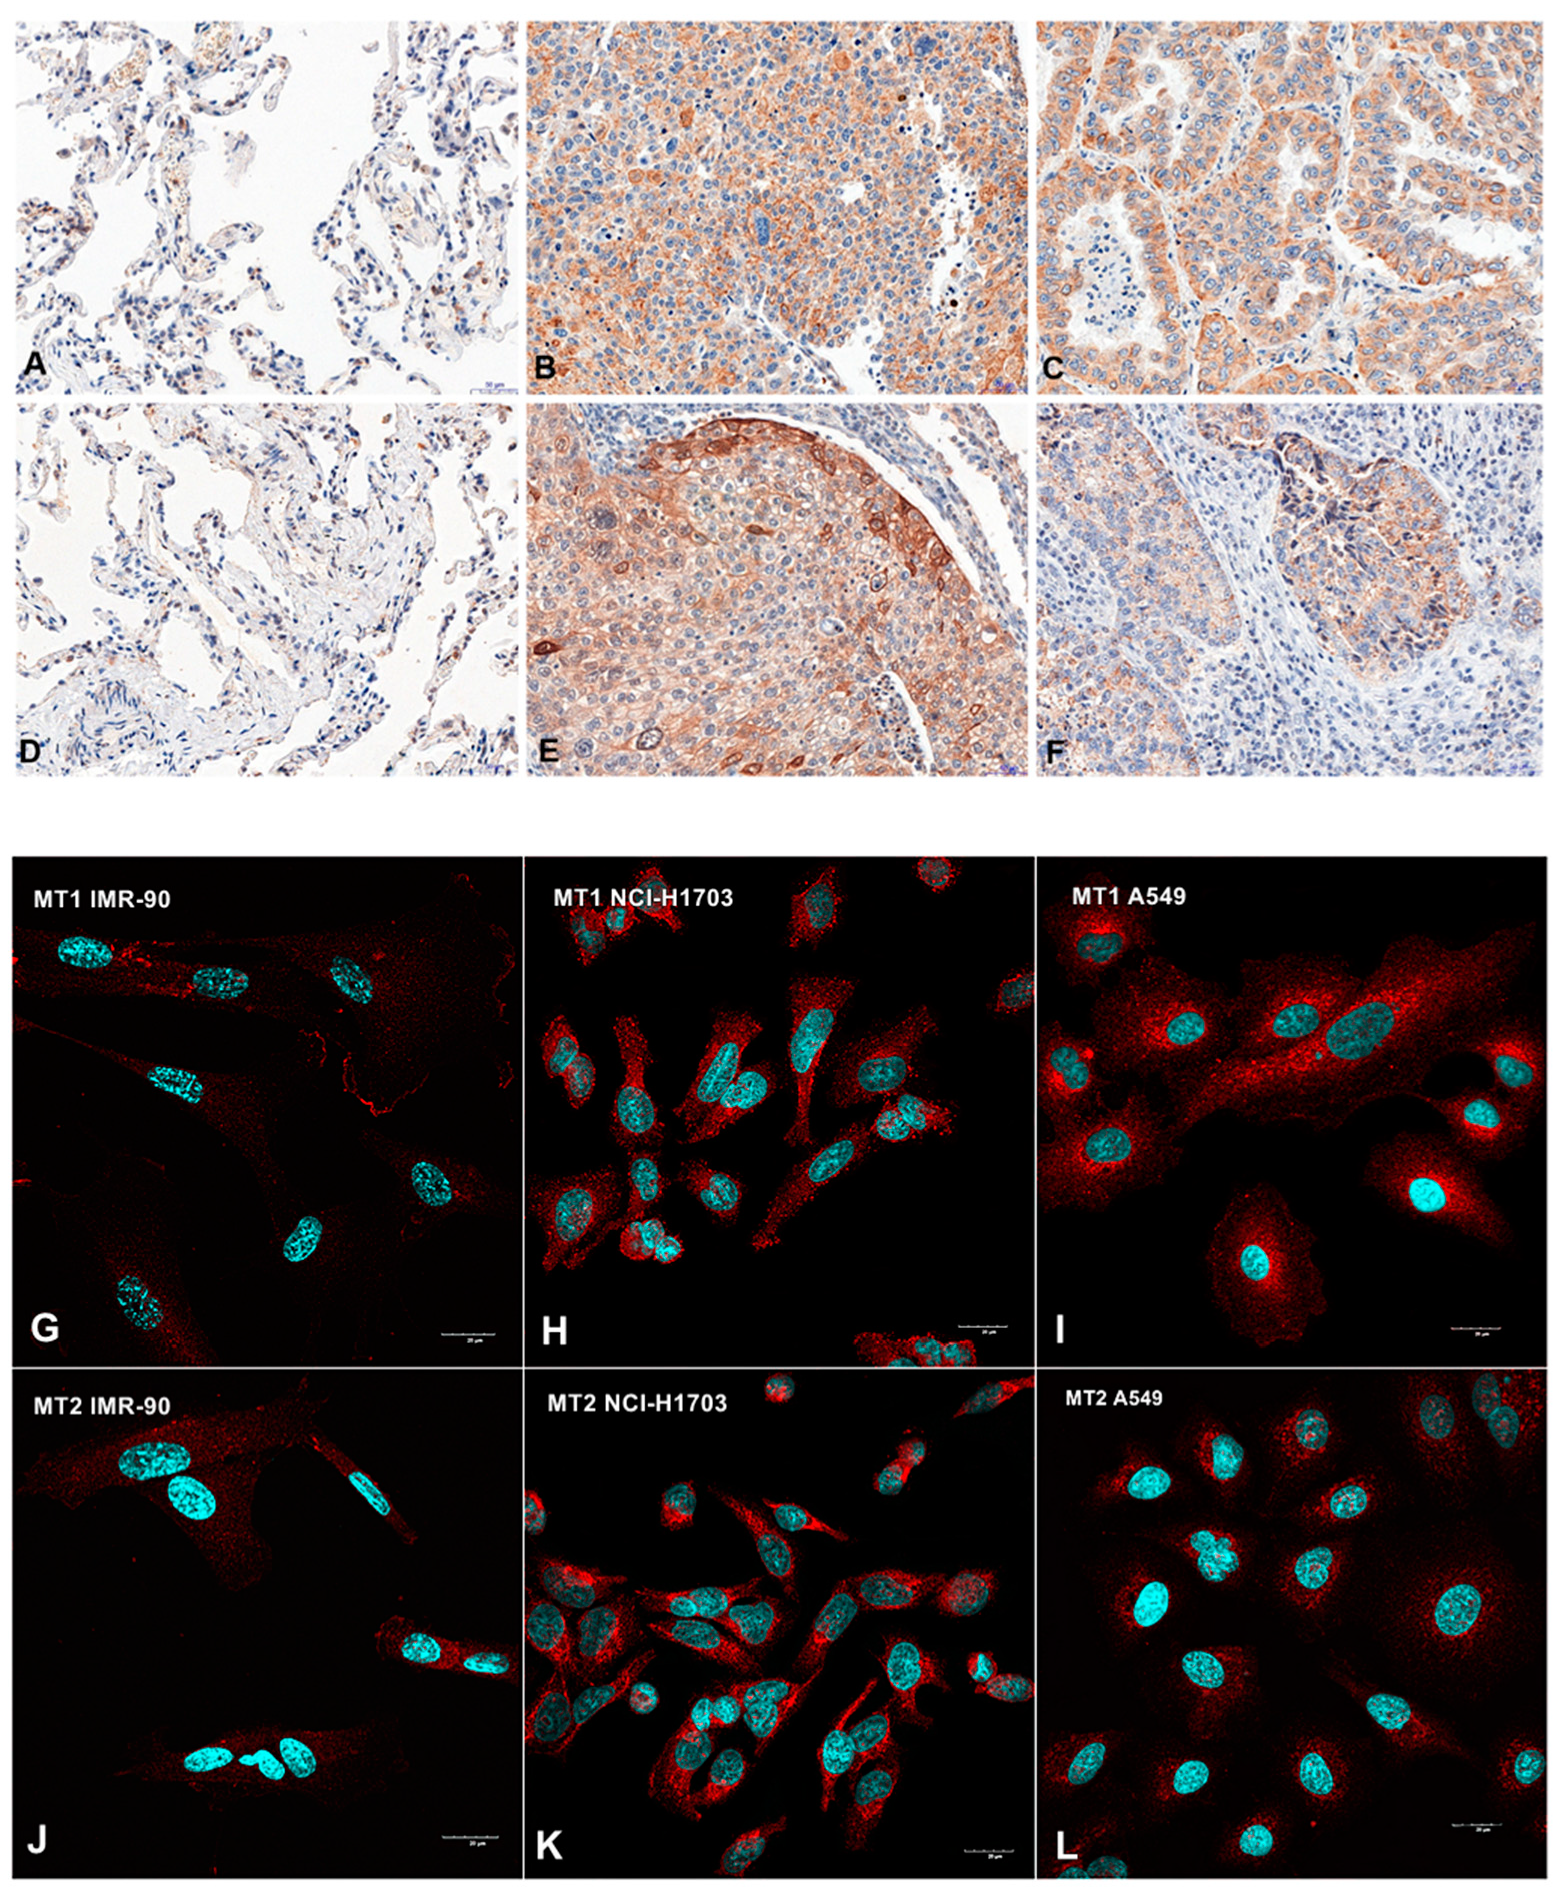 Cancers | Free Full-Text | Prognostic Impact of Melatonin Receptors